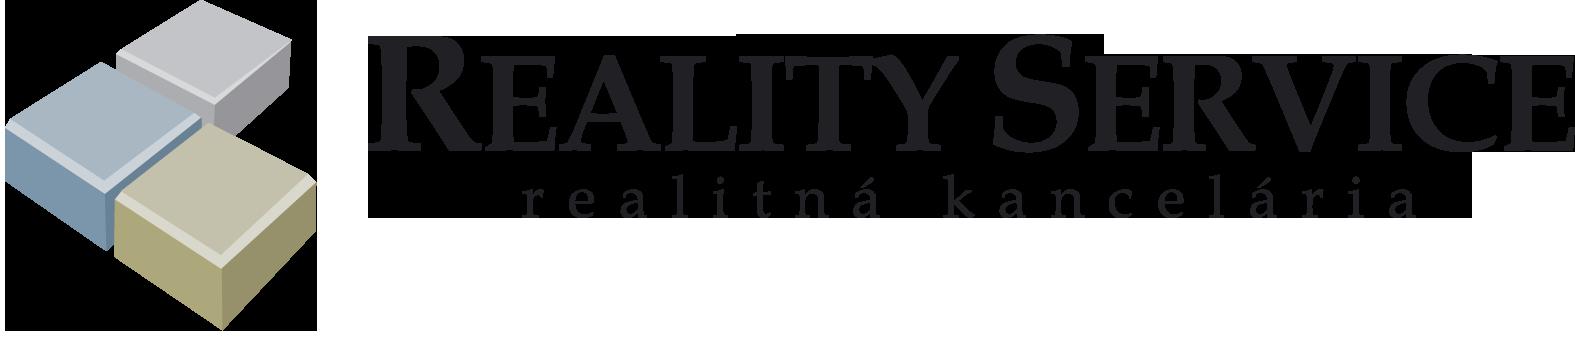 Reality Service RK